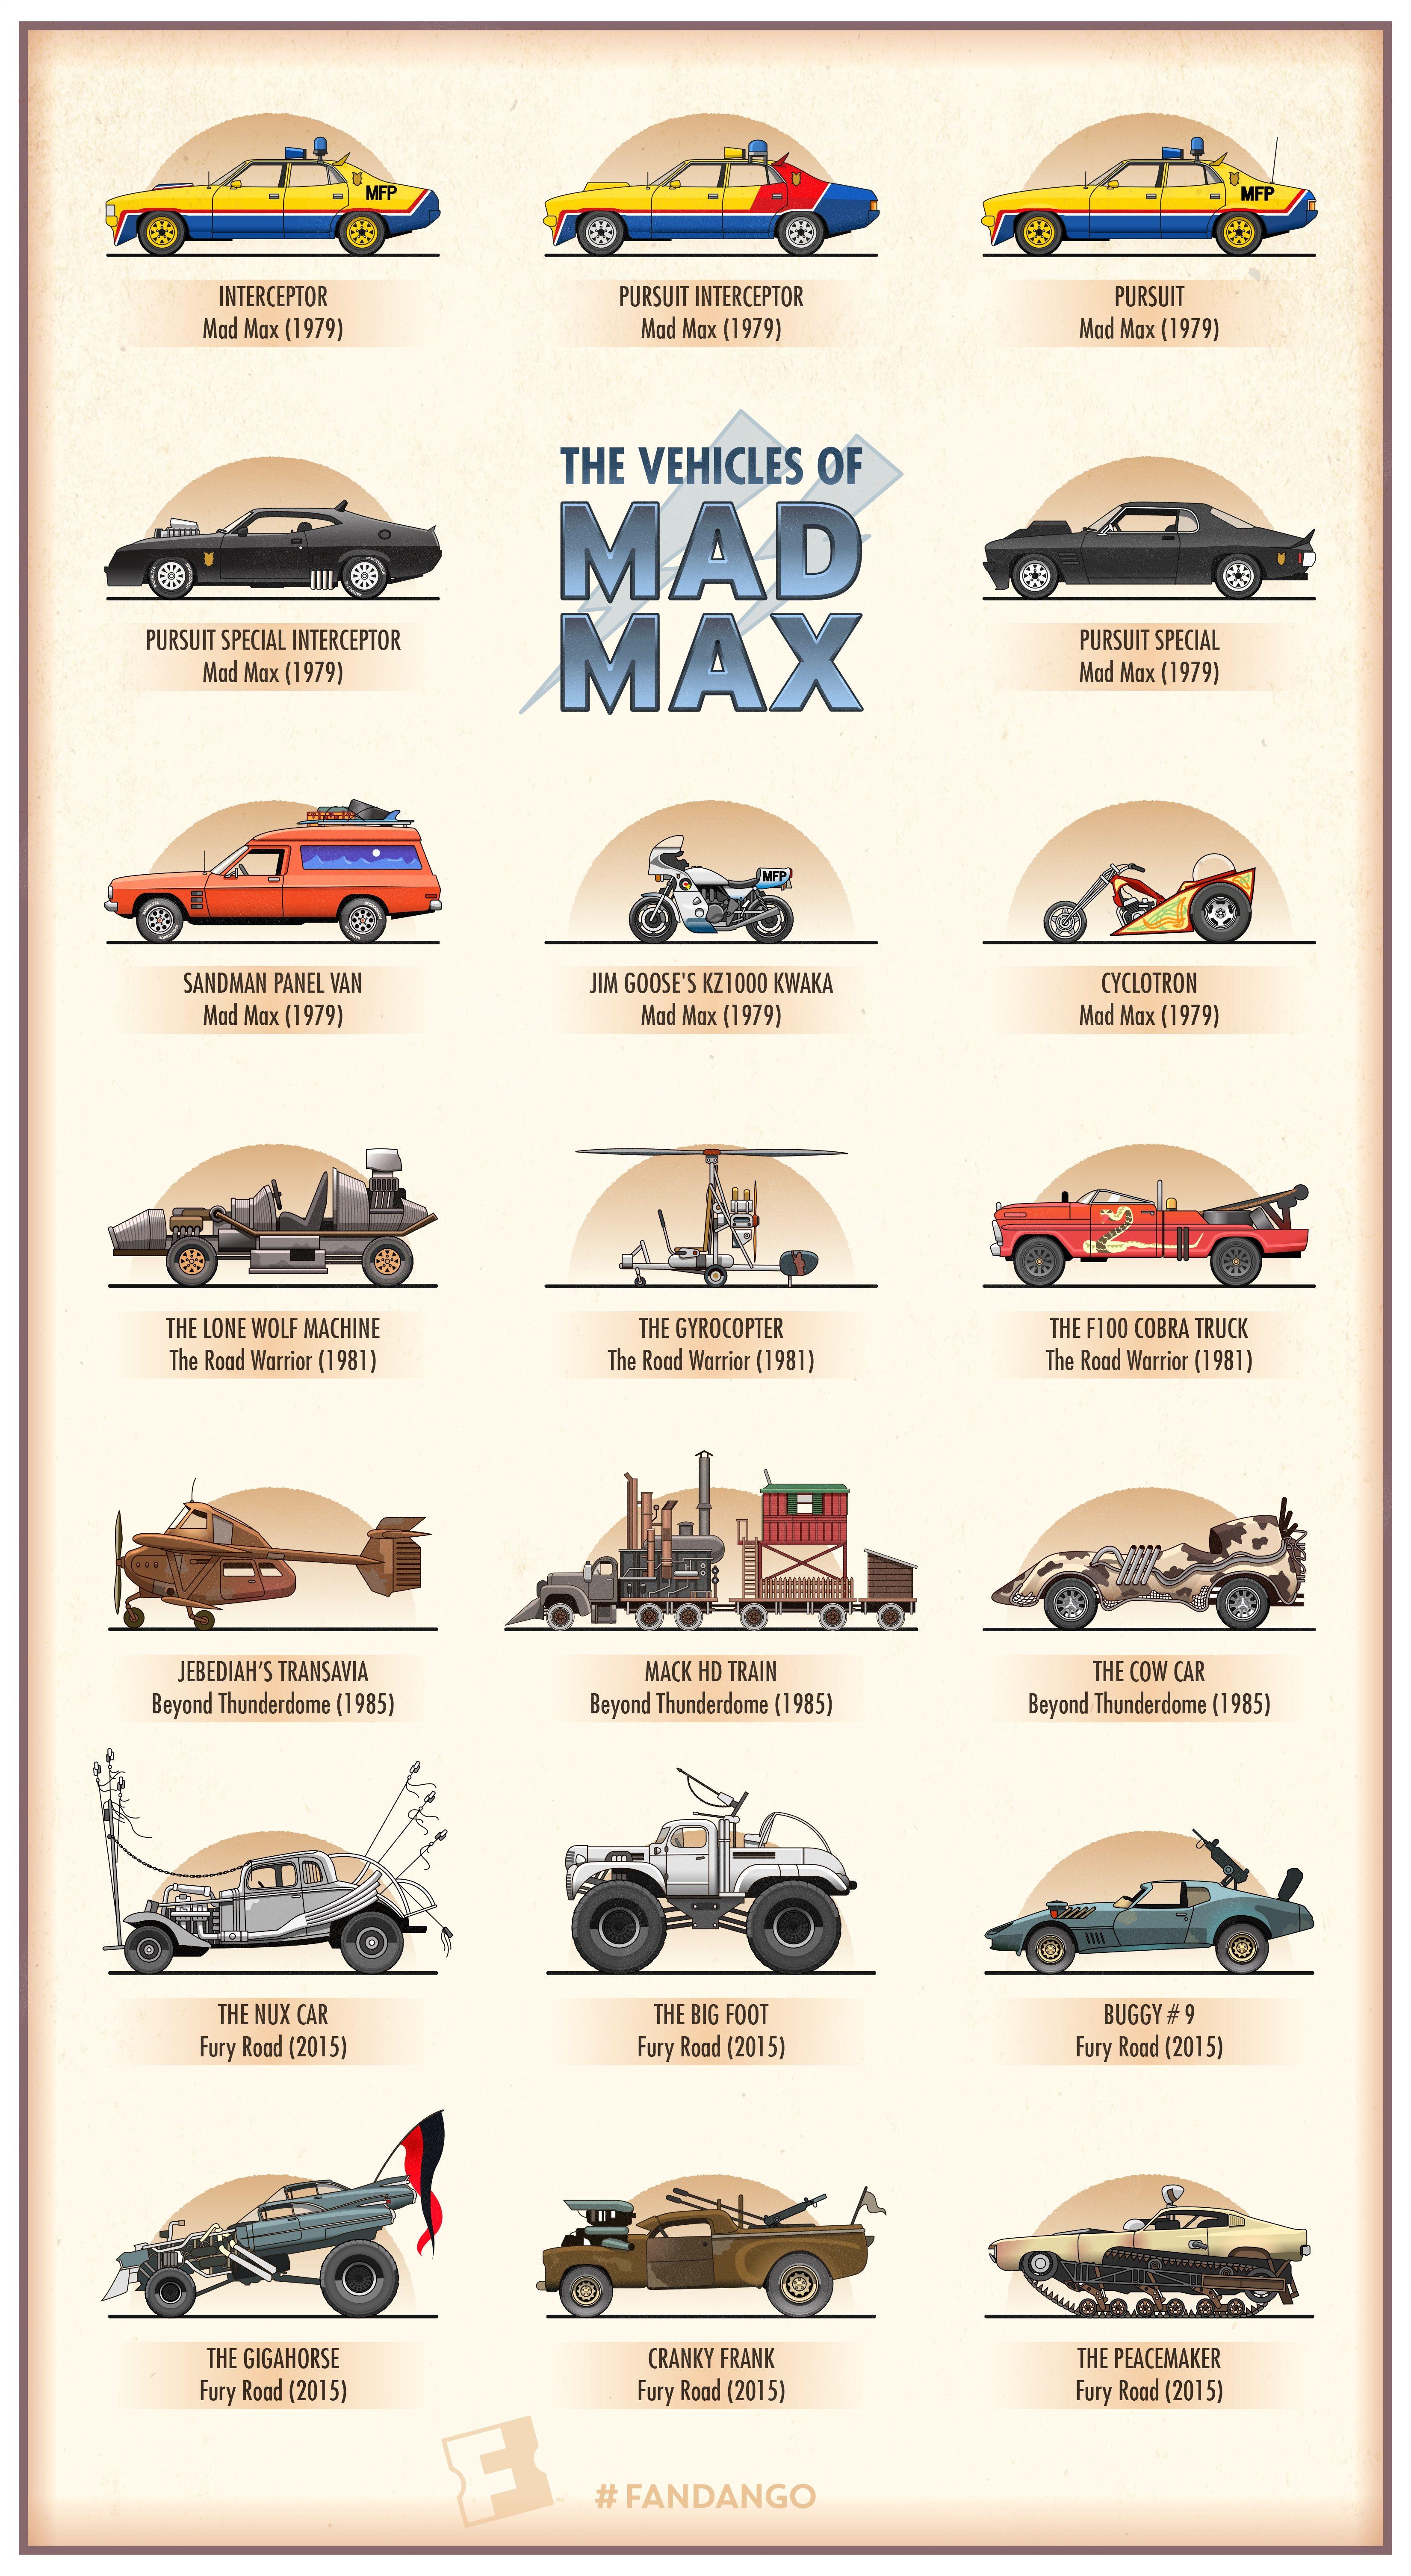 ArtworkThe Mad Carros MaxJuguetes Vehicles Exclusive De Of PnX0k8Ow